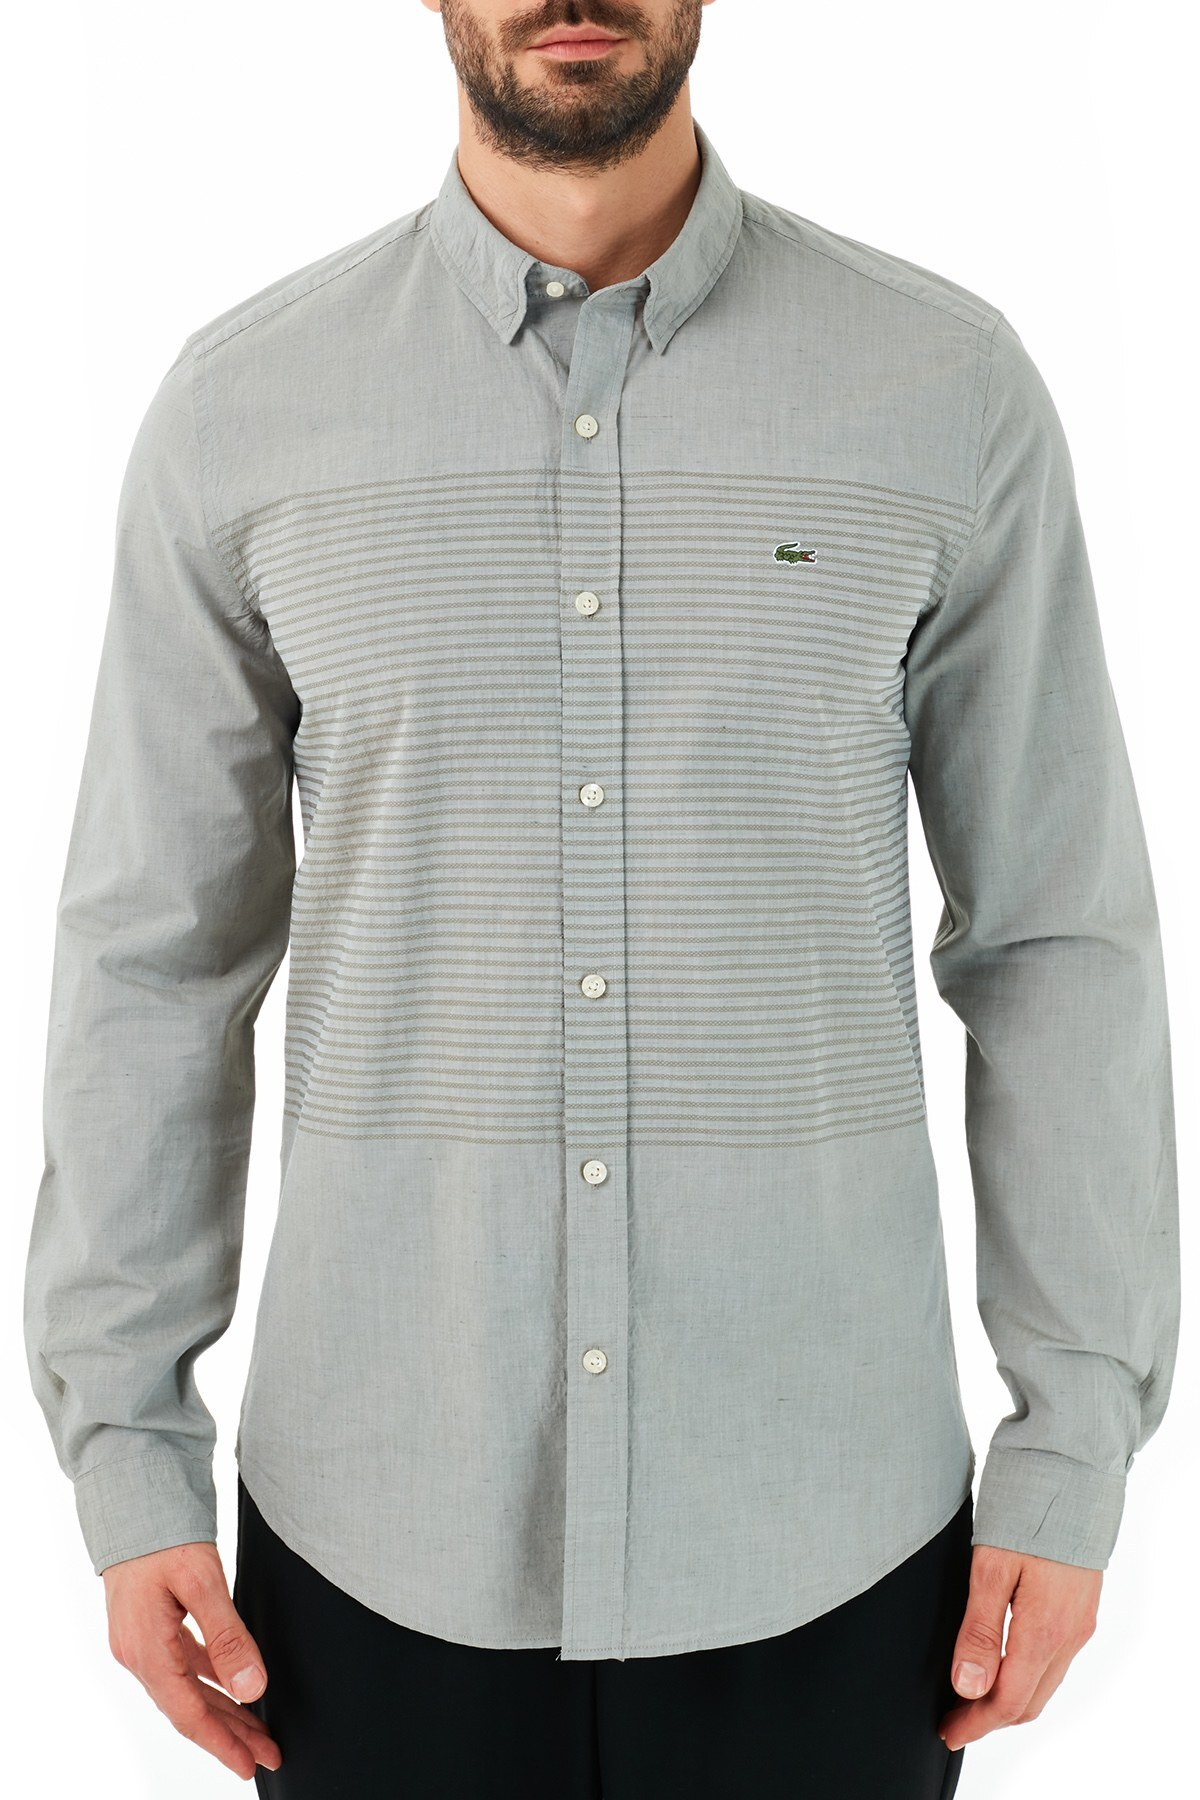 Lacoste Slim Fit Pamuklu Uzun Kollu Erkek Gömlek CH0192 92H HAKİ